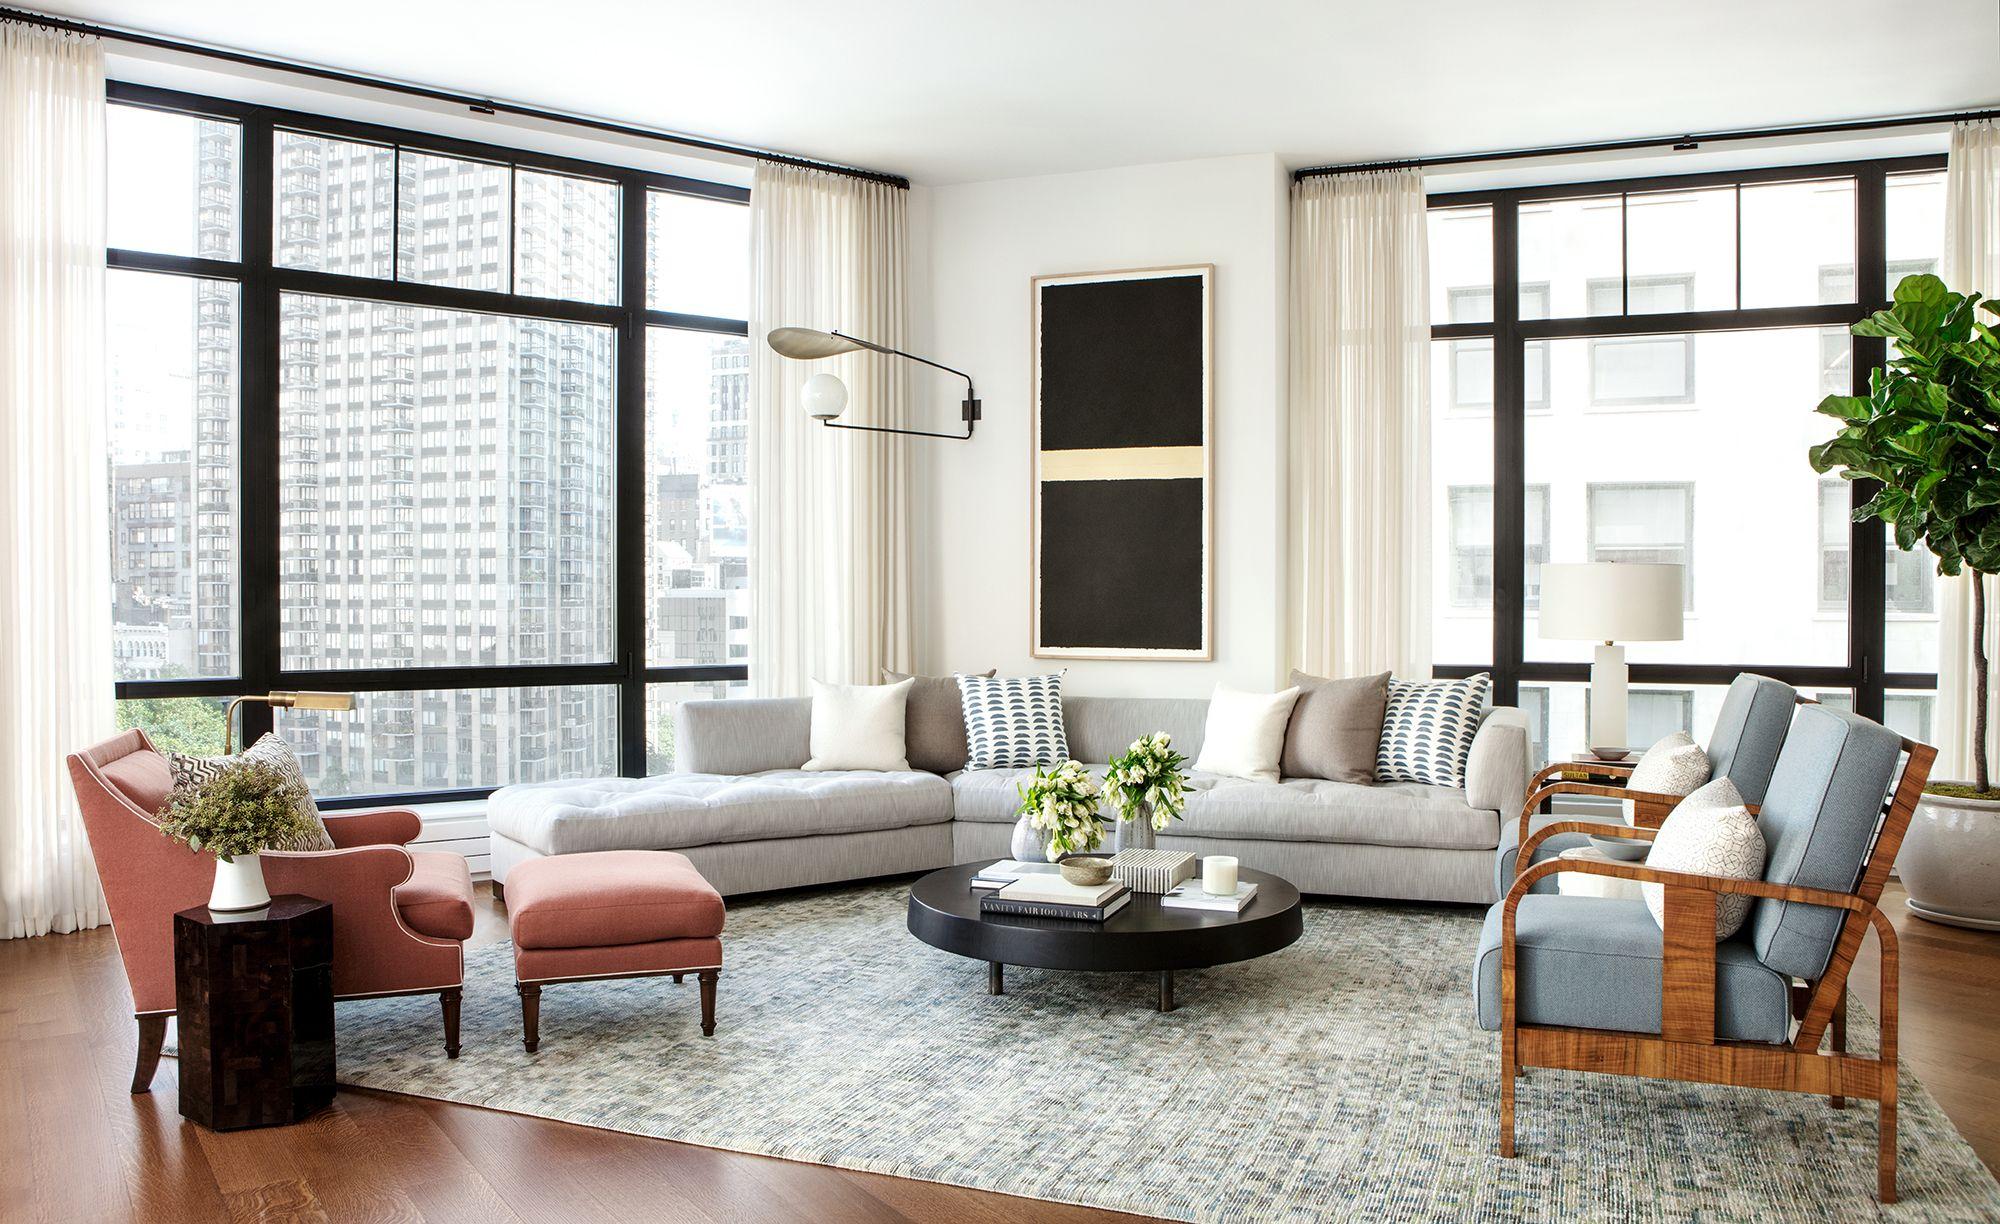 30 living room furniture layout ideas how to arrange seating in a rh elledecor com